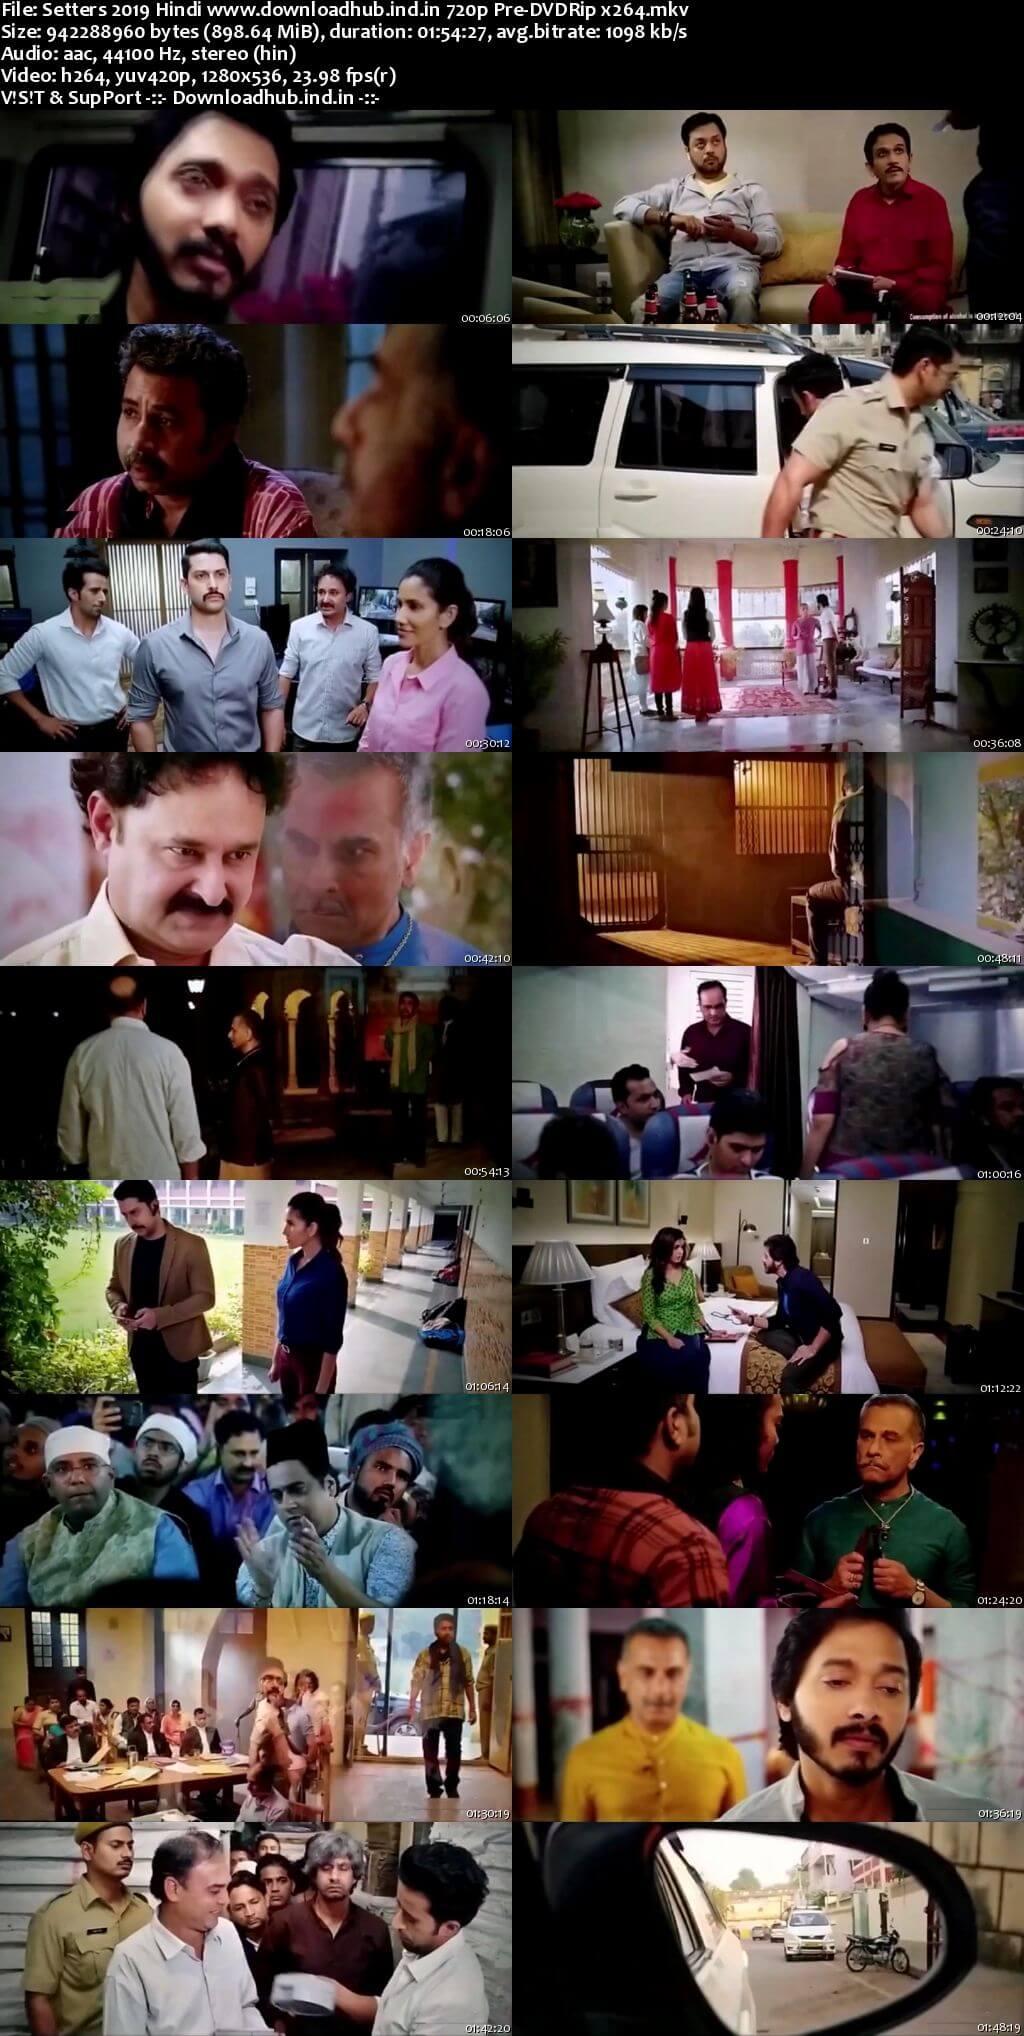 Setters 2019 Hindi 720p Pre-DVDRip x264